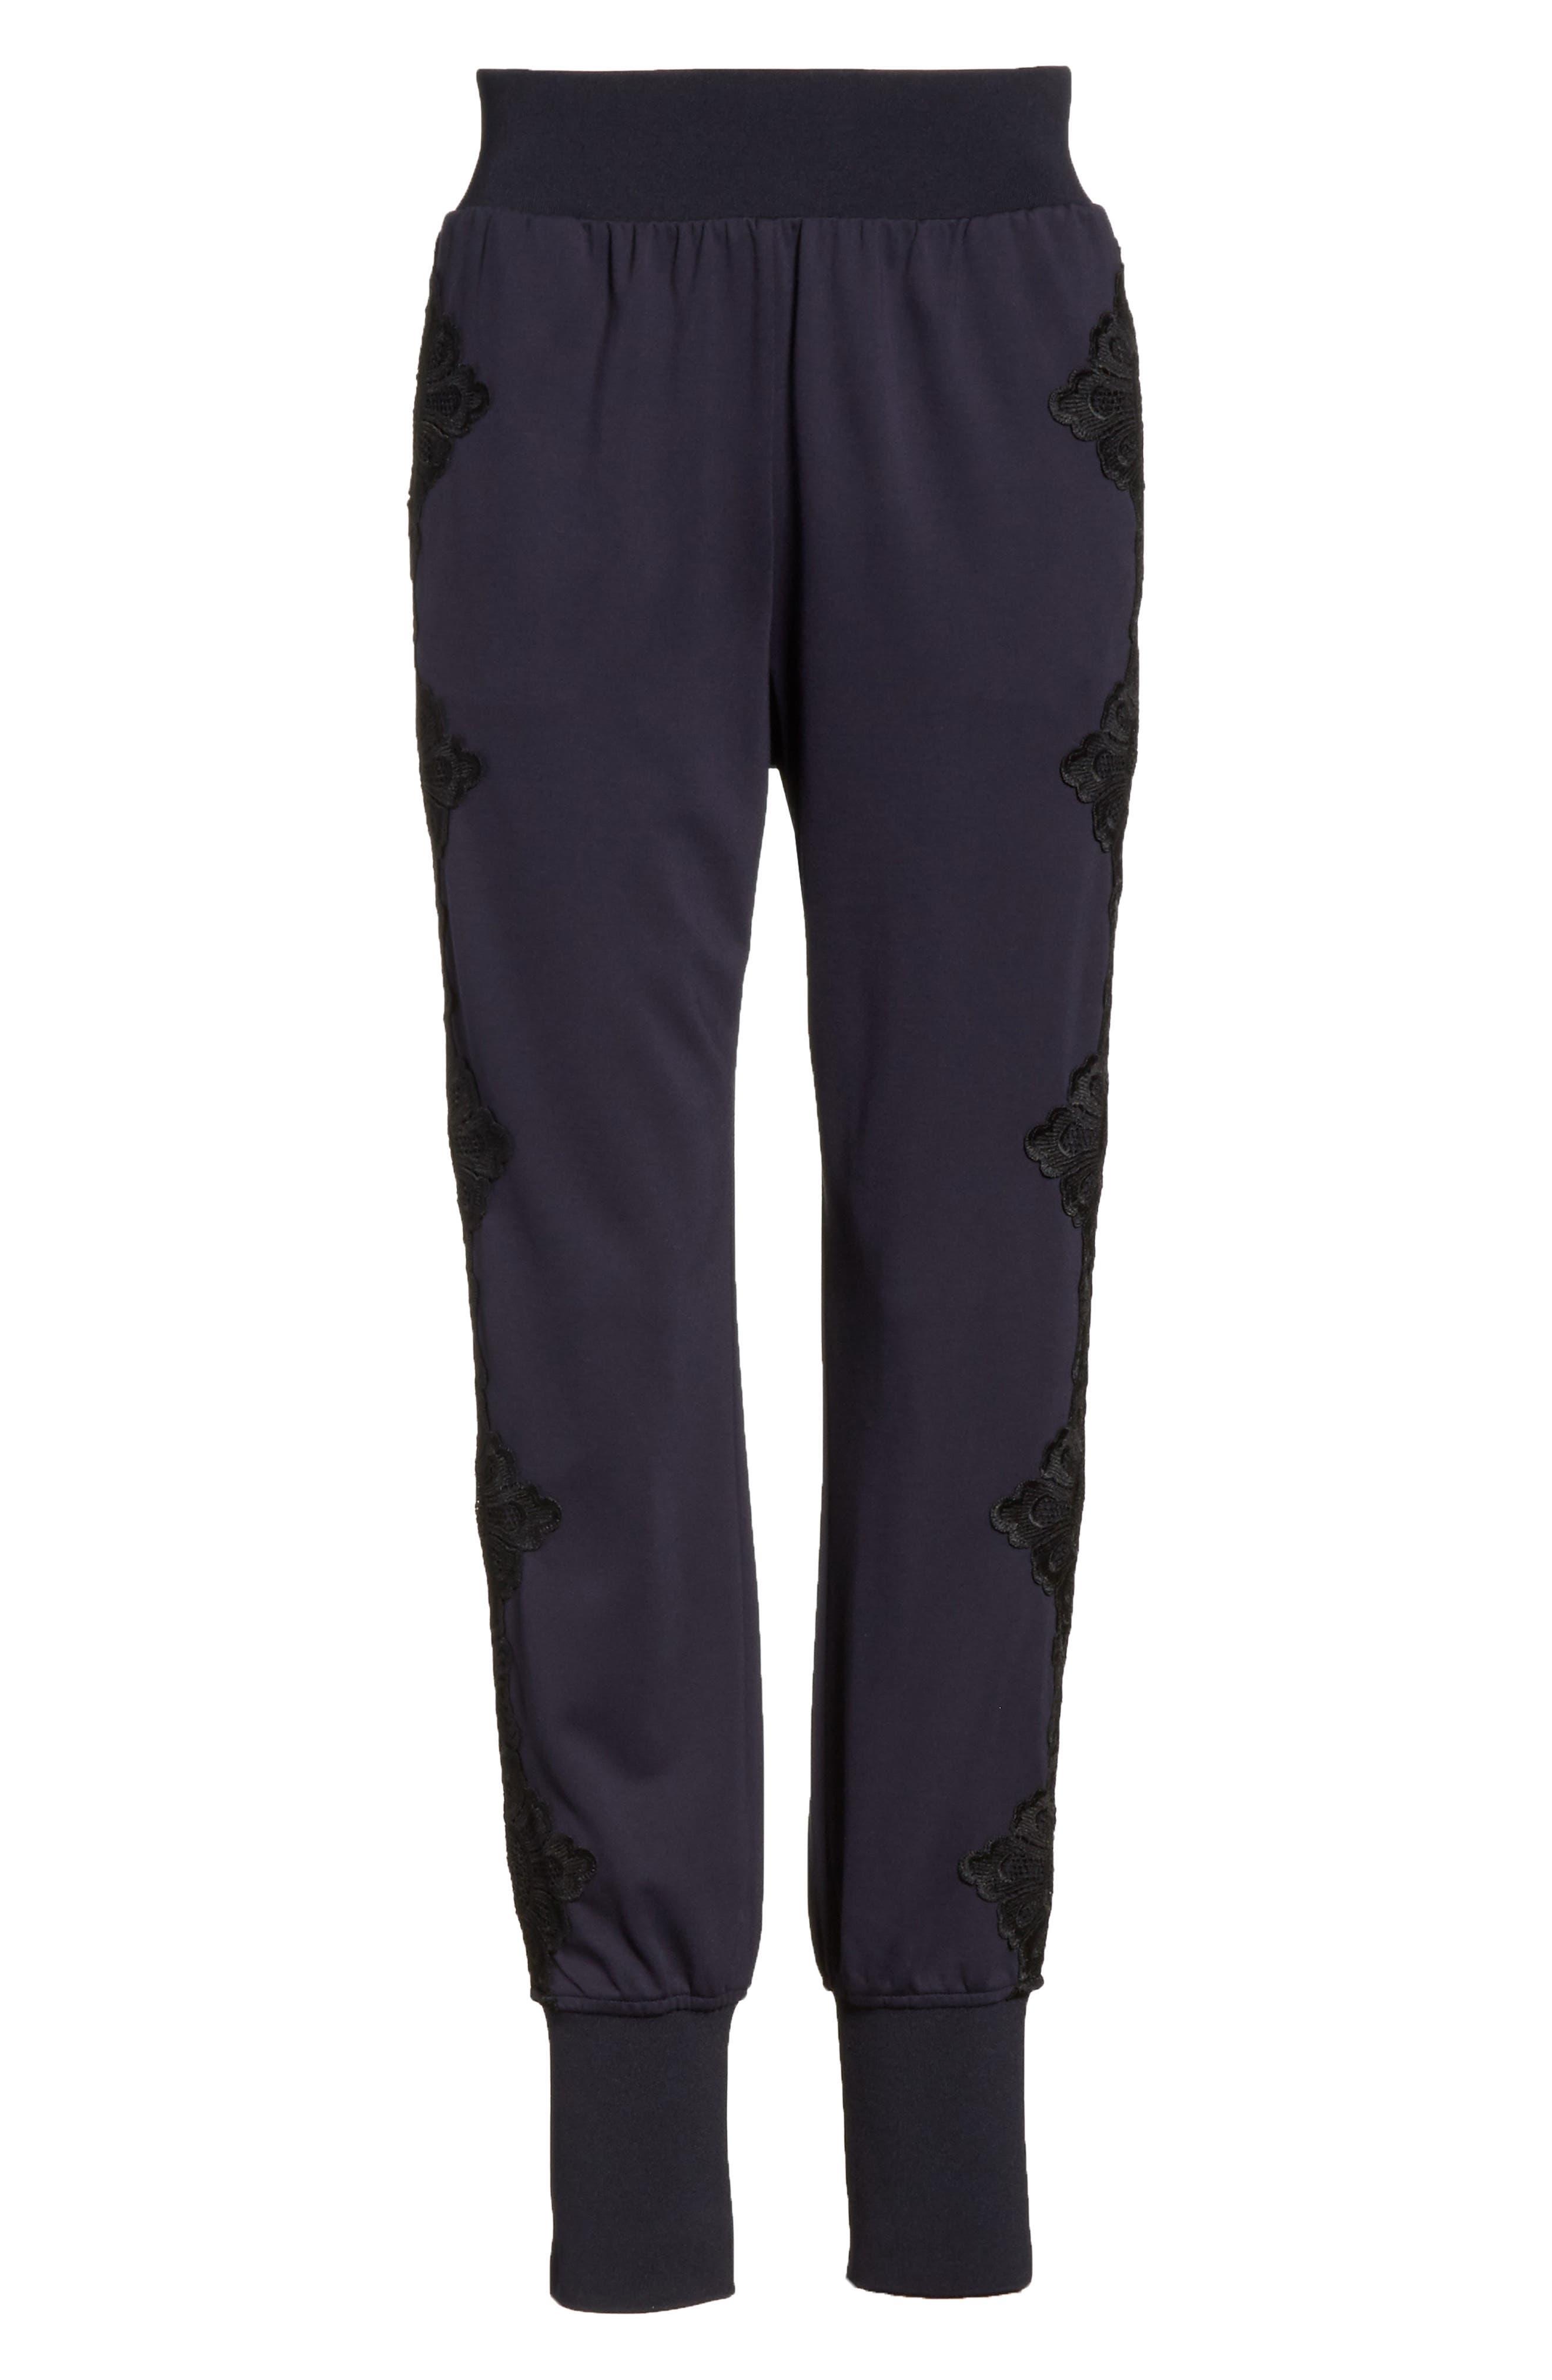 Lizeeba Lace Trim Jogger Pants,                             Alternate thumbnail 5, color,                             Navy